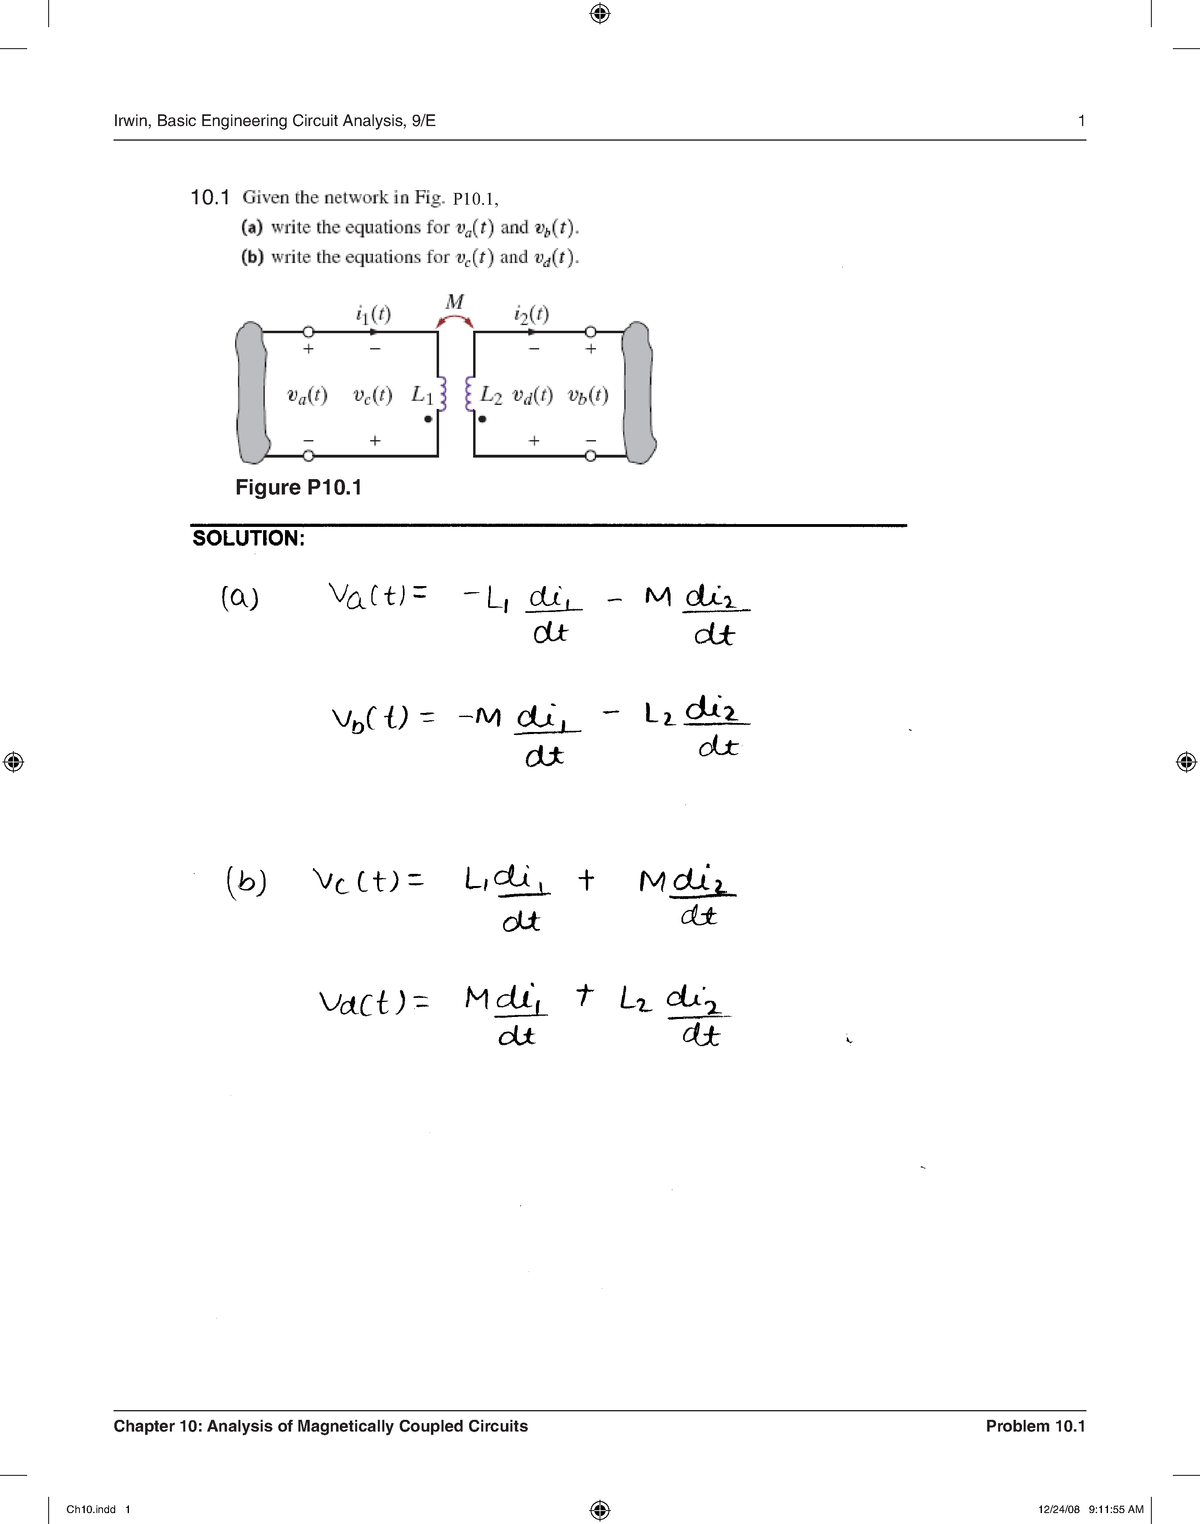 Solution Manual Irwin 9th edition Ch 10 - StuDocu